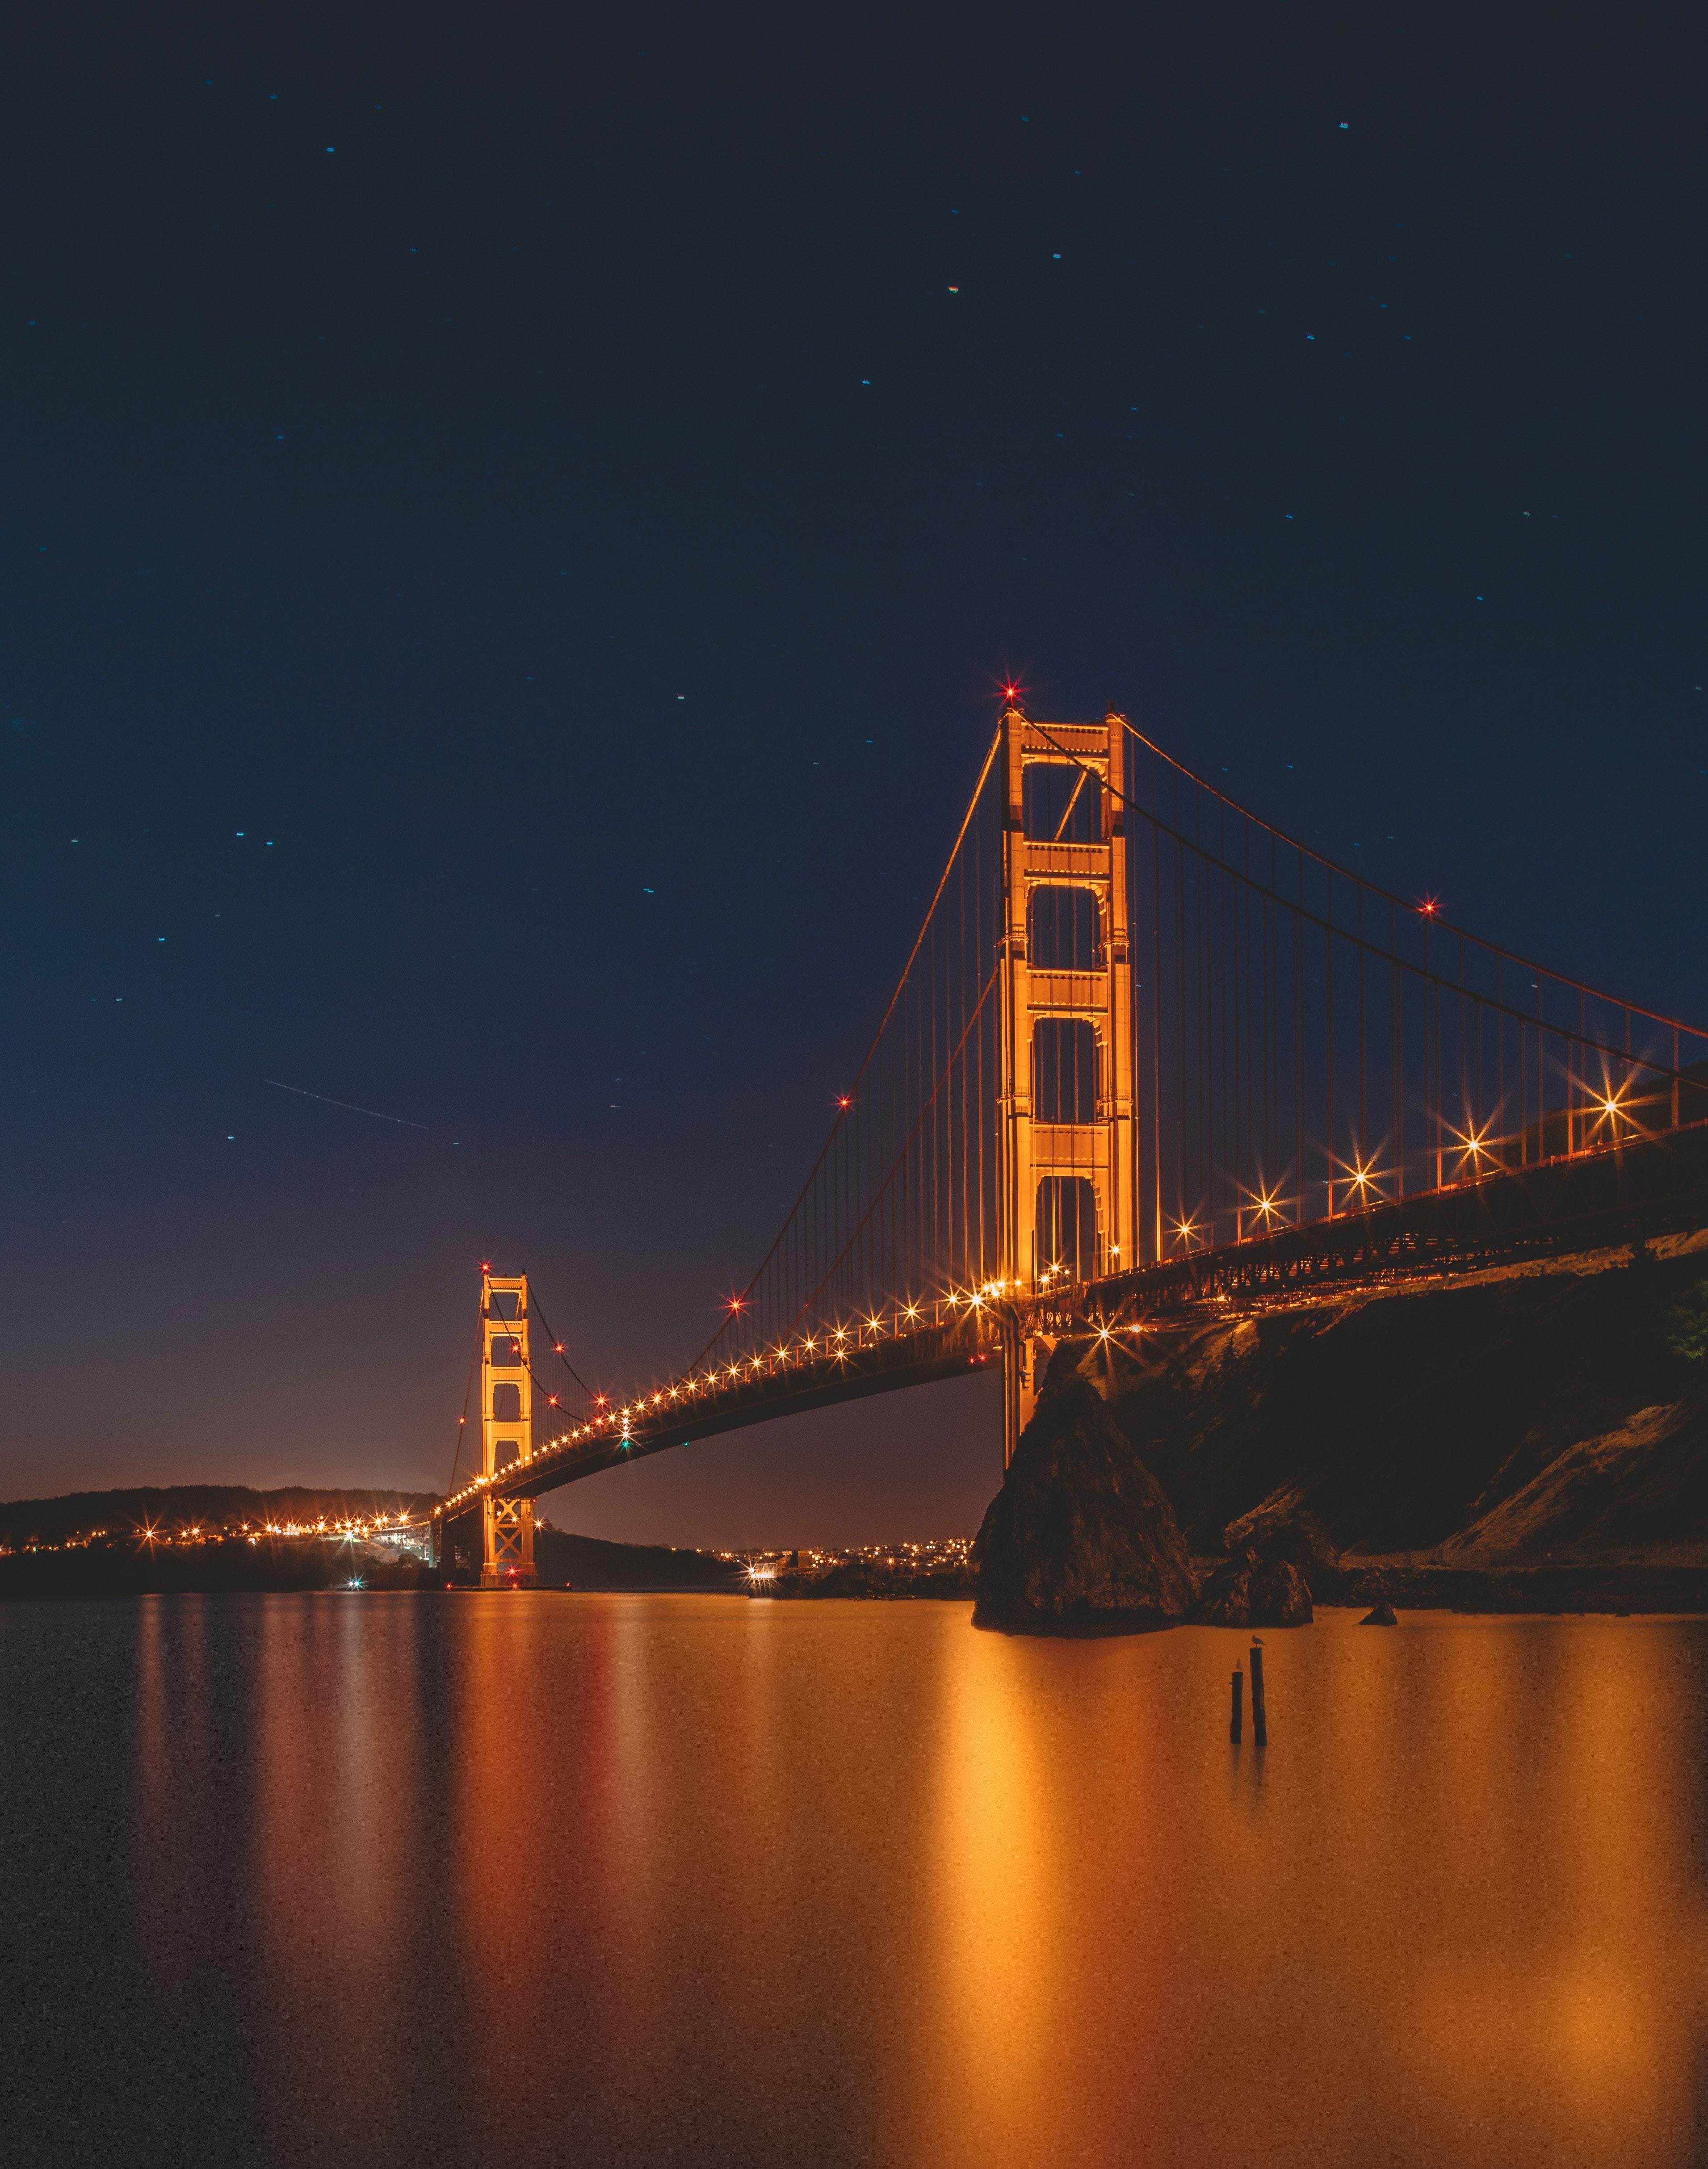 500 Golden Gate Bridge Pictures Download Free Images On Unsplash